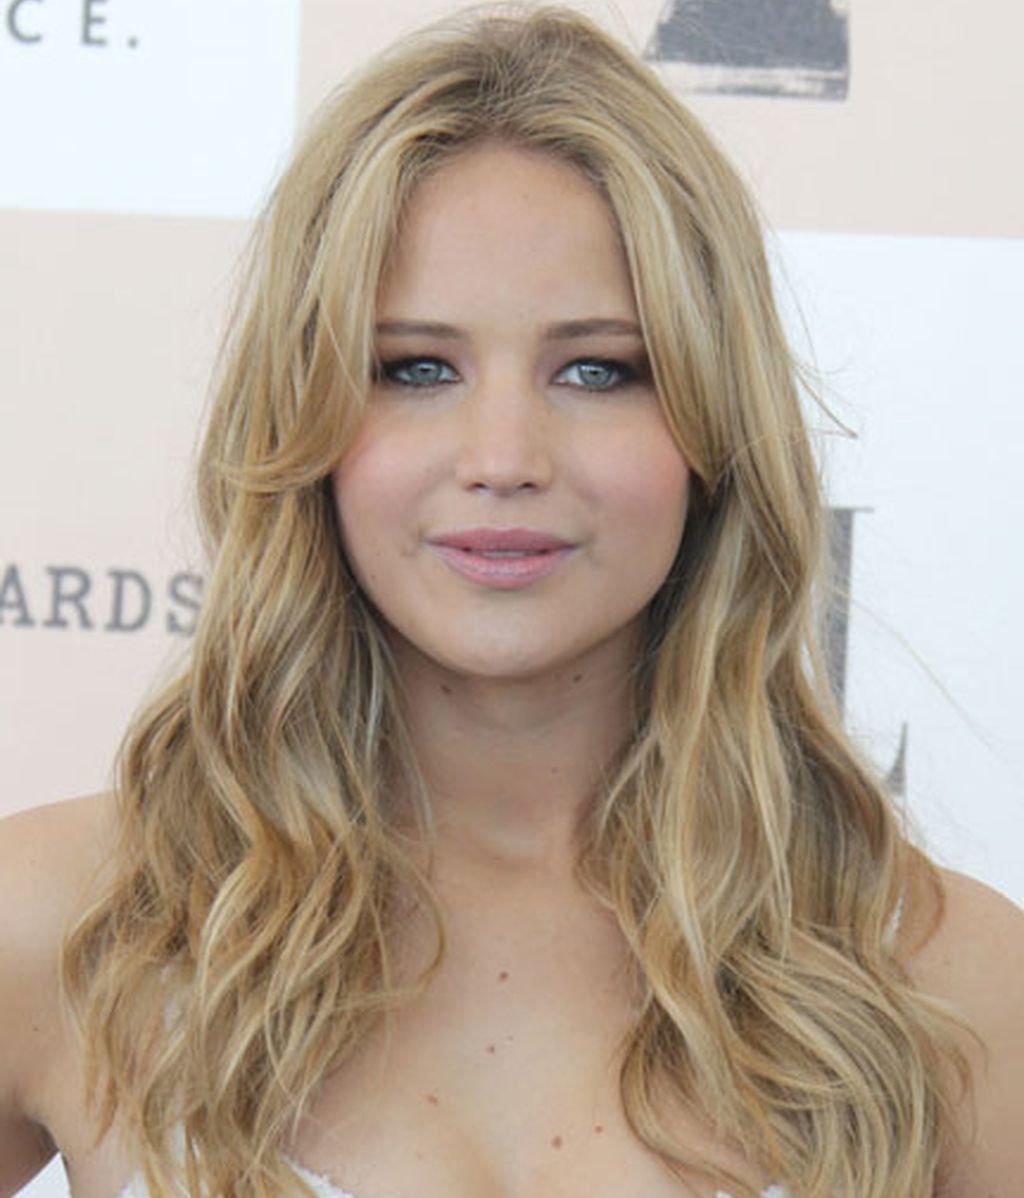 13.Jennifer Lawrence